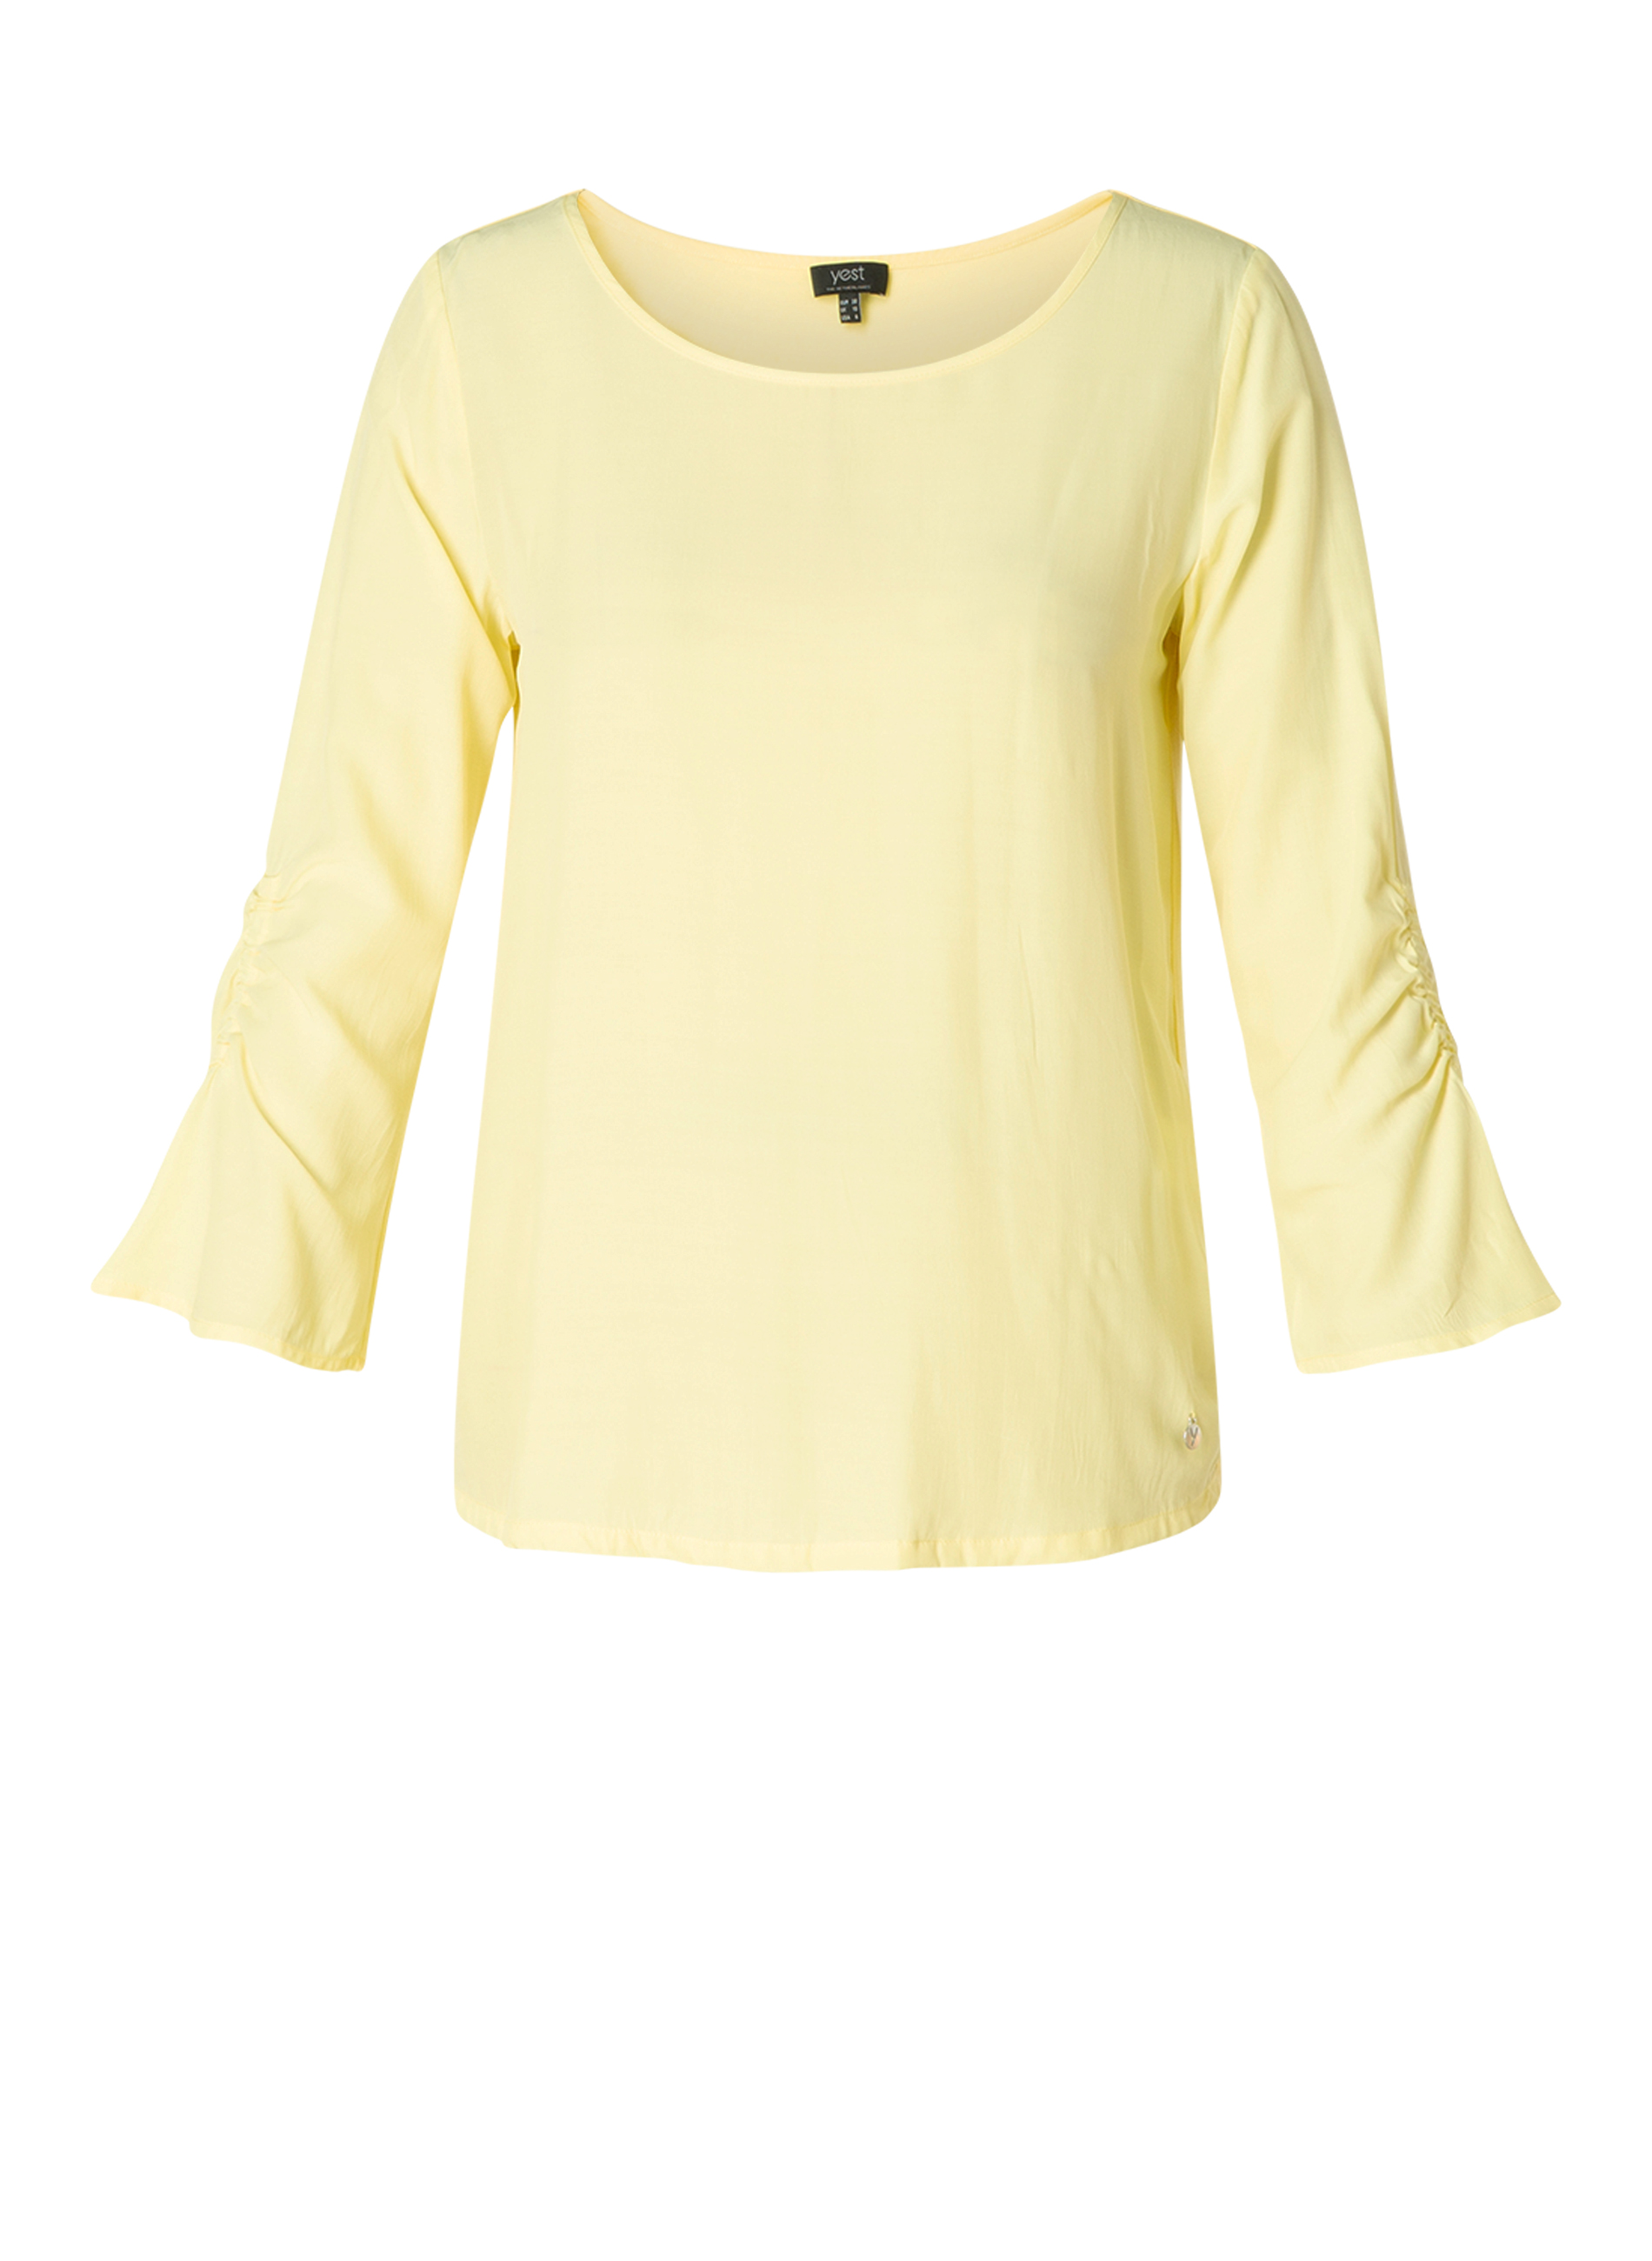 Yesta blouse Jarieke 76 cm